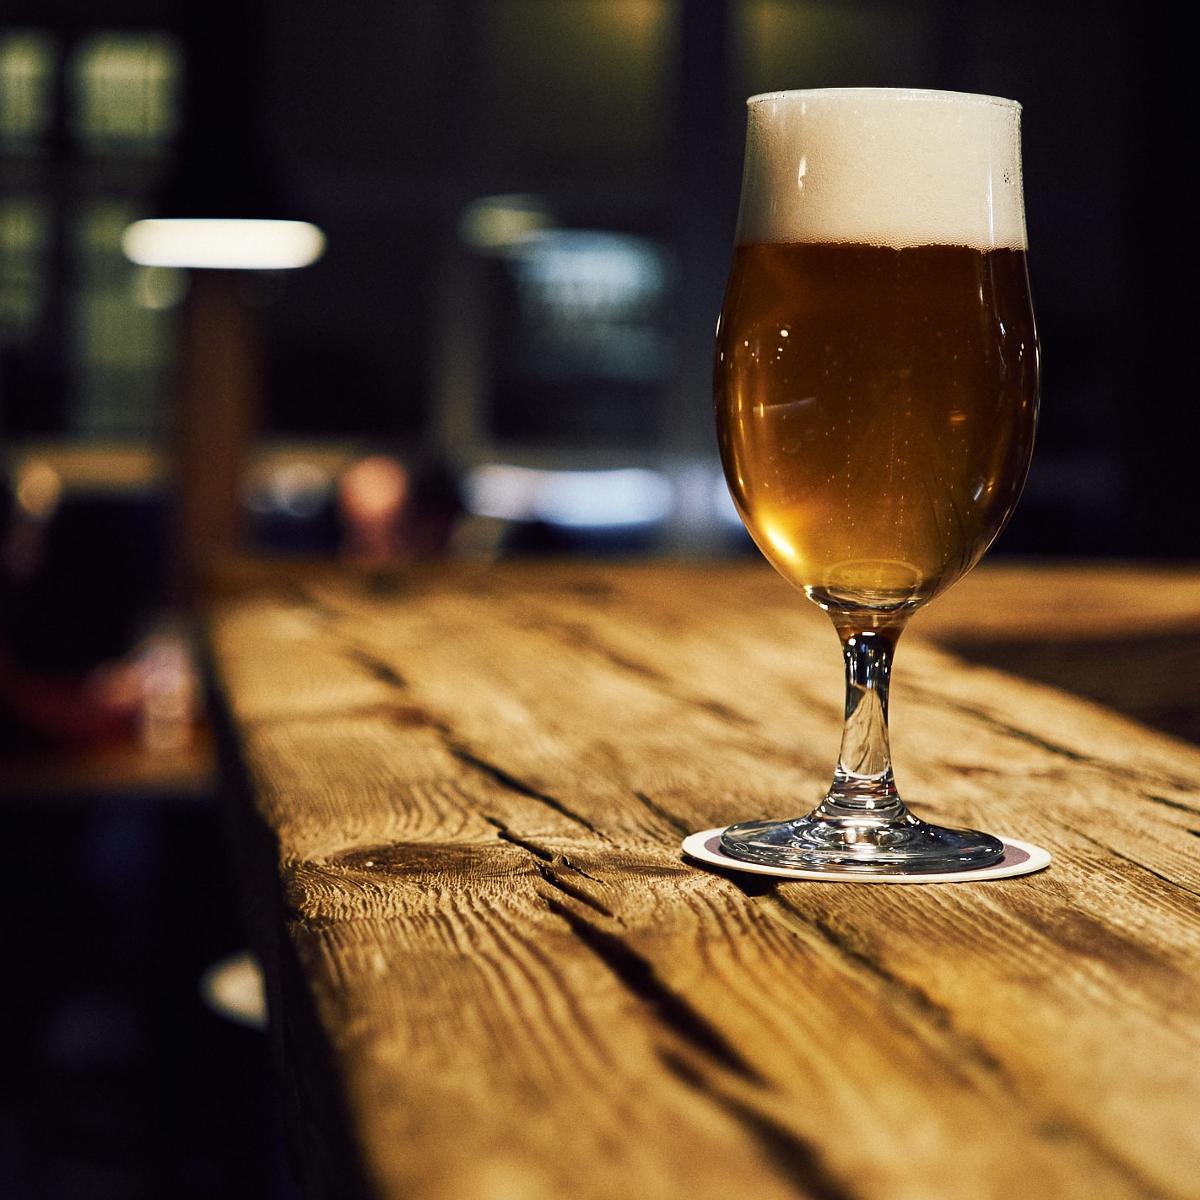 beer (Photo by radovan on Unsplash https___unsplash.com_photos